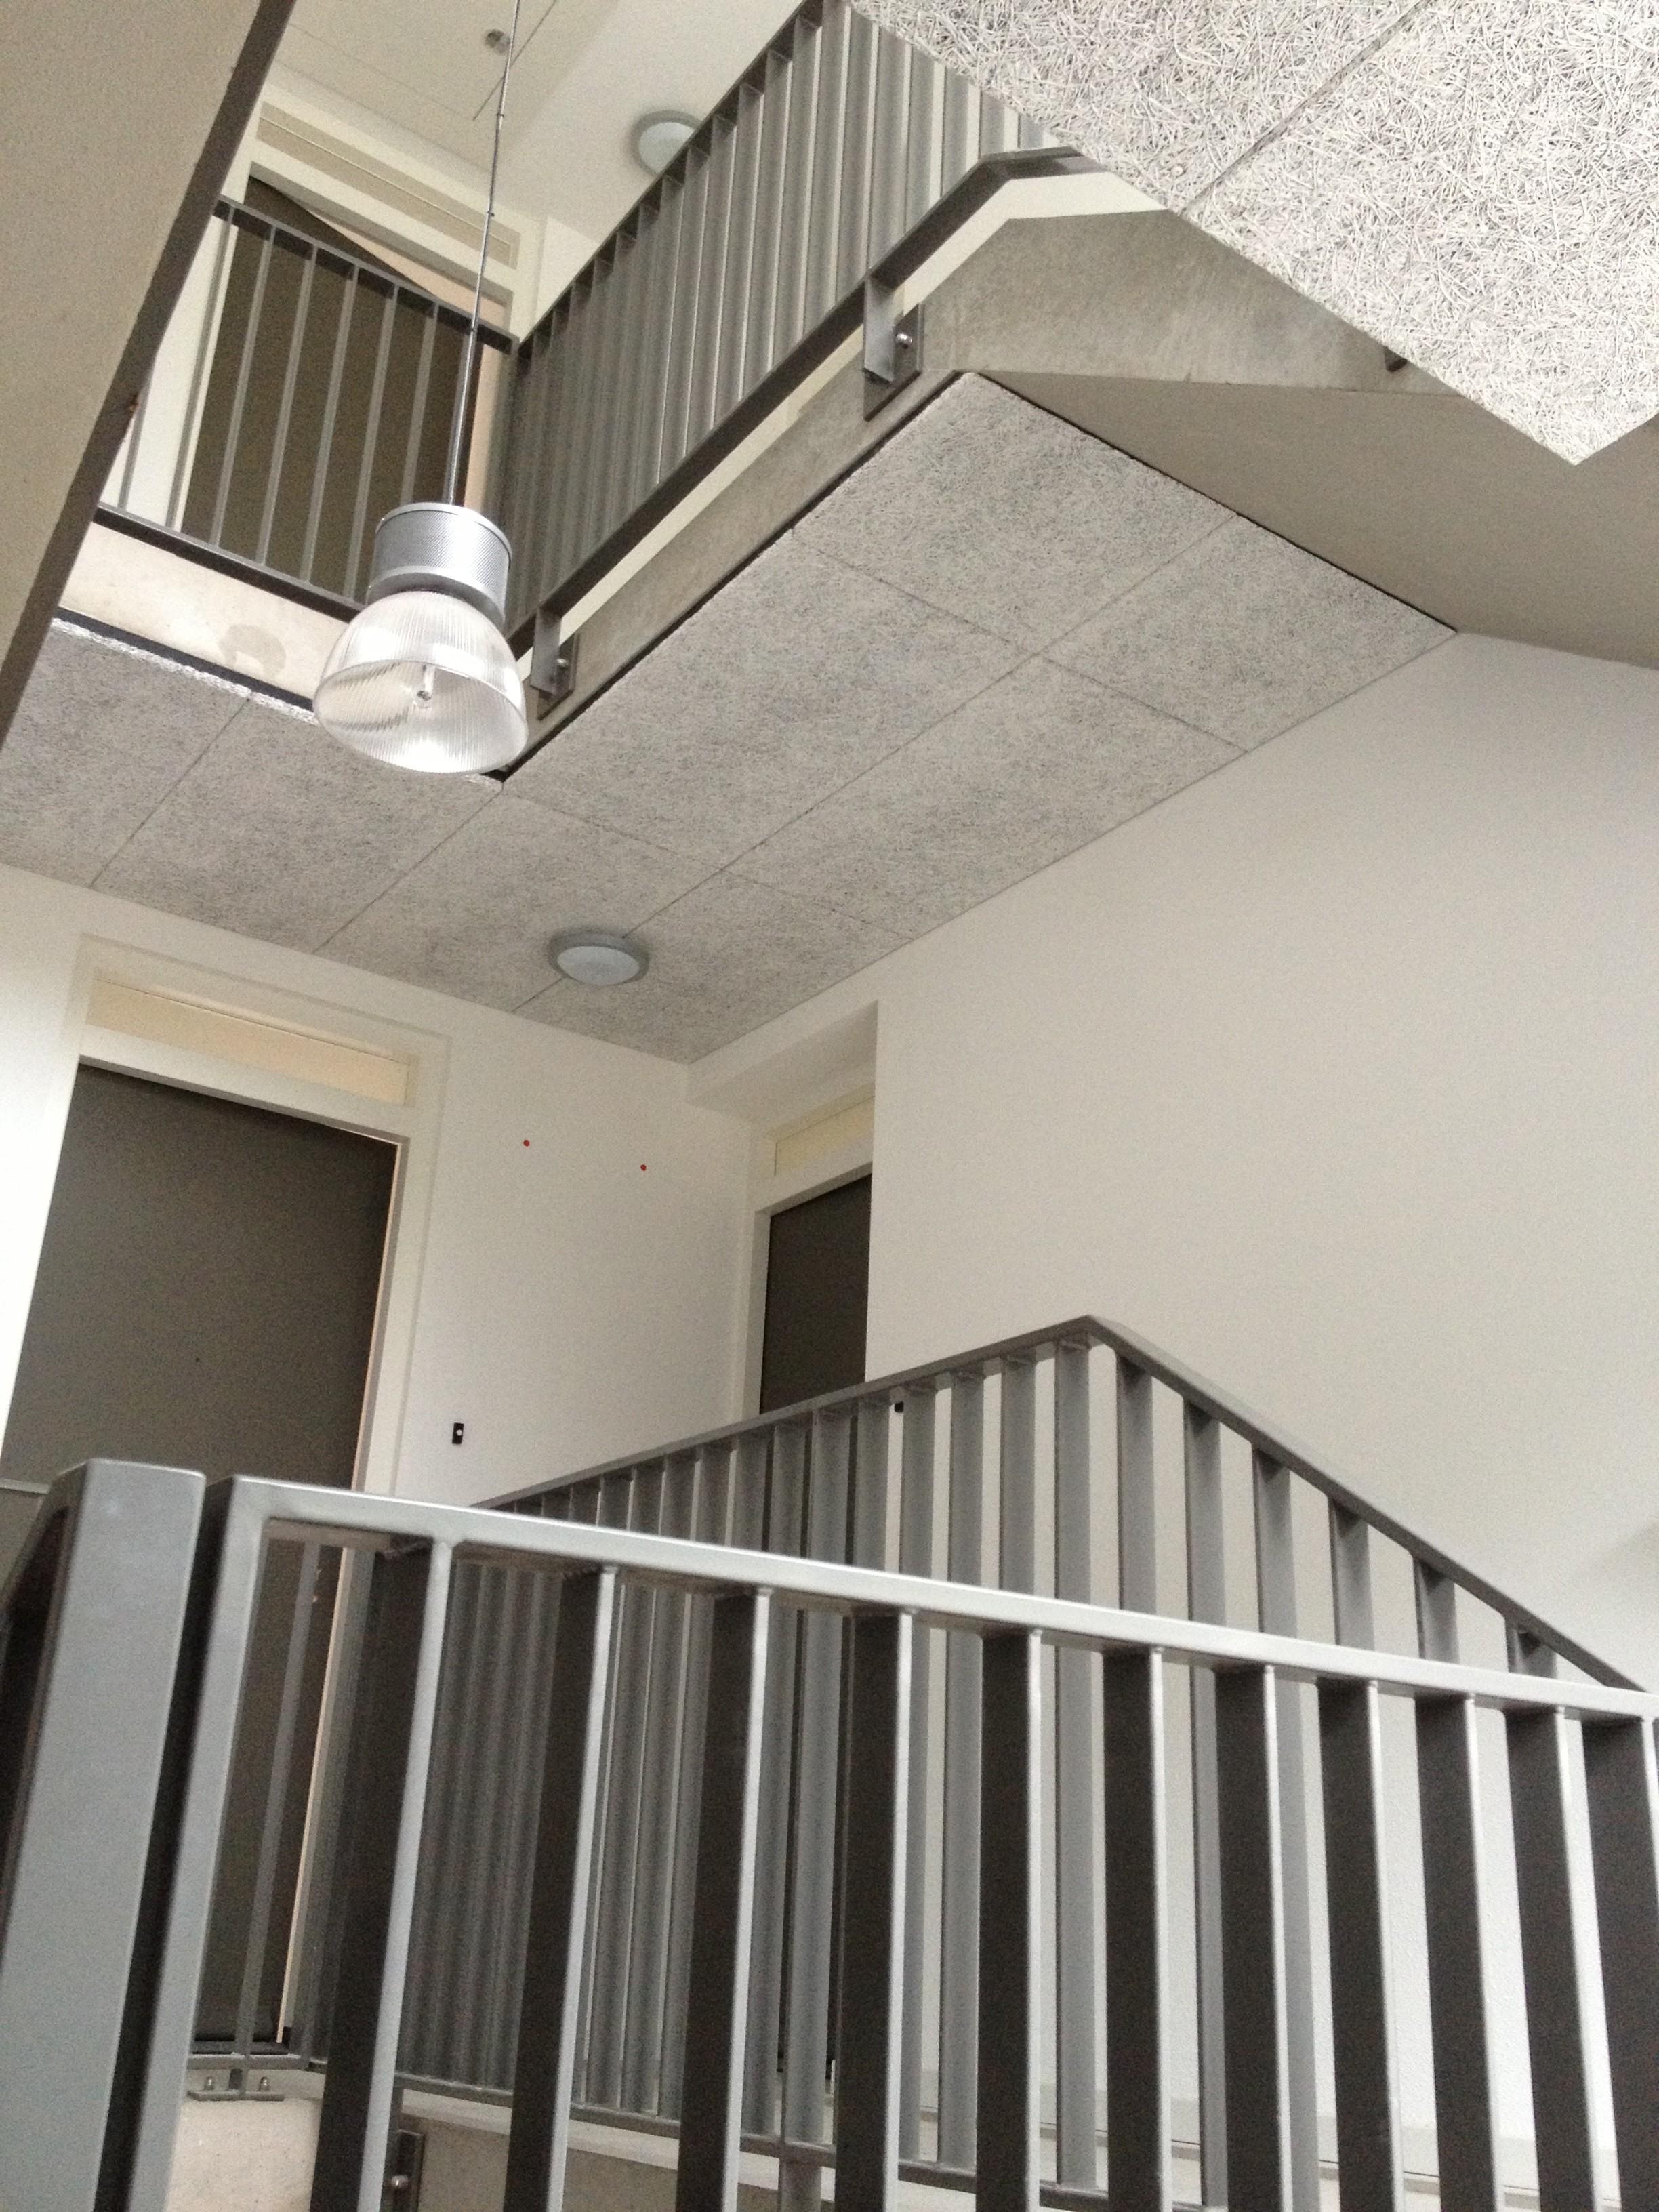 BKT_provides_devriesenverburg_IJsselstein_appartementen_Panoven_parkeerkelder_schuindak_metslwerk_zink_bouwbord_Cubord_Esbi_05.jpg